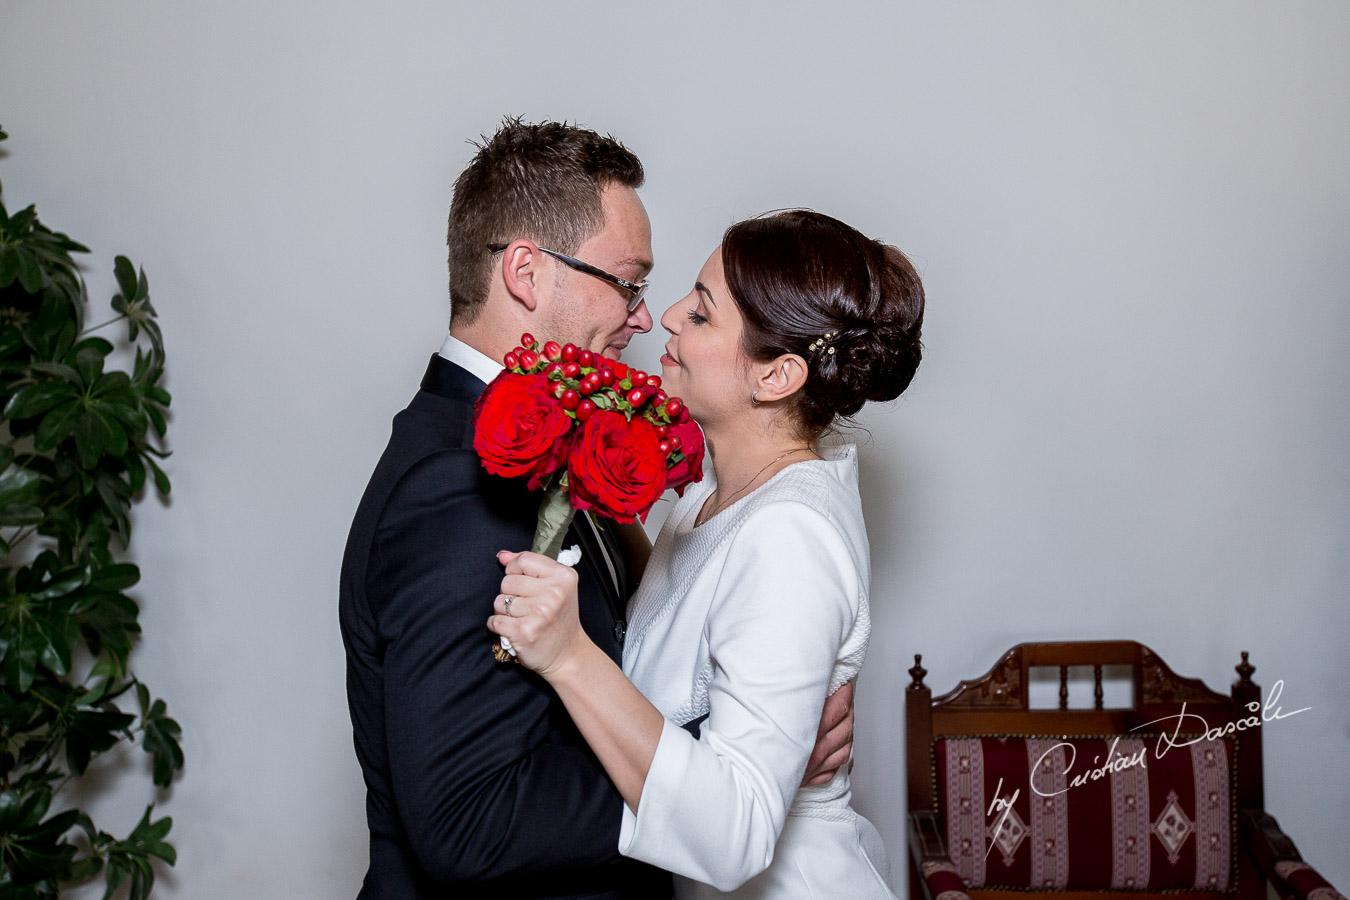 Simple Marriage Ceremony - Irina & Dragos 06